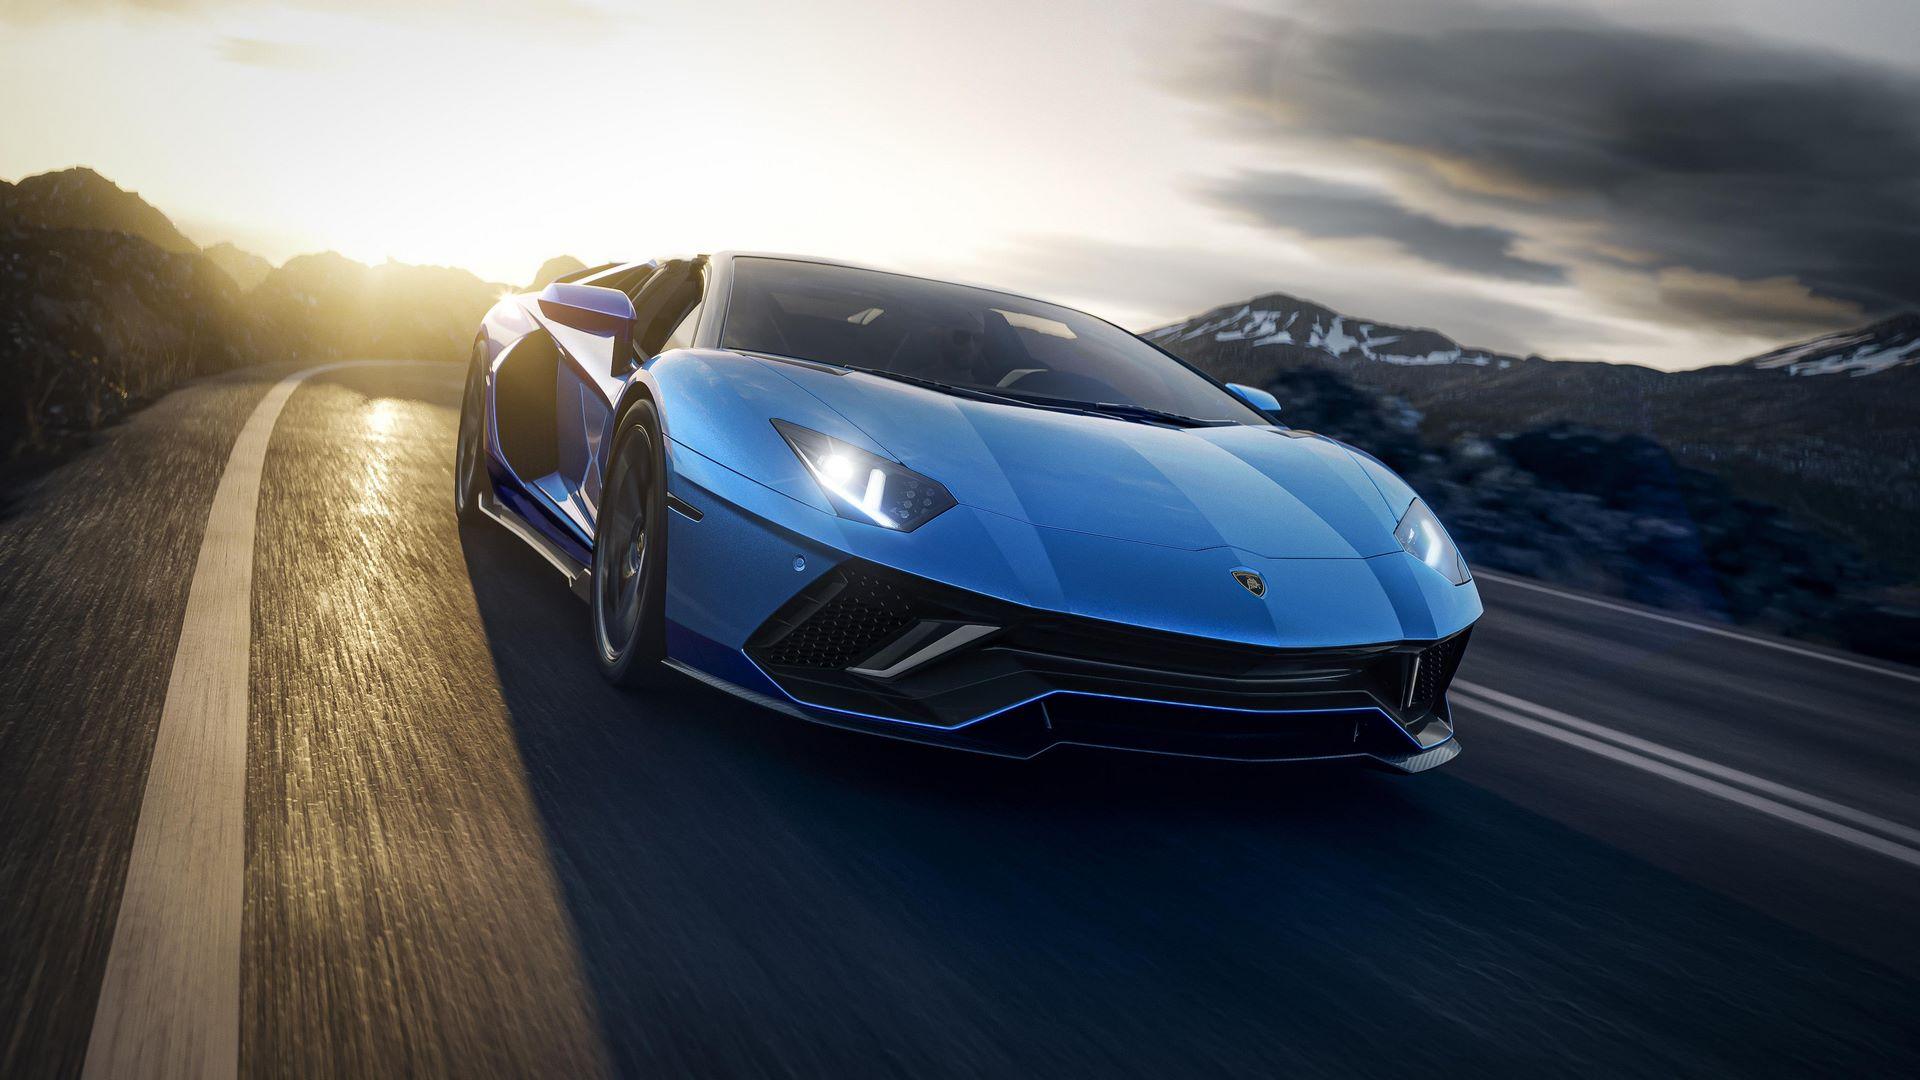 Lamborghini-Aventador-LP780-4-Ultimae-21